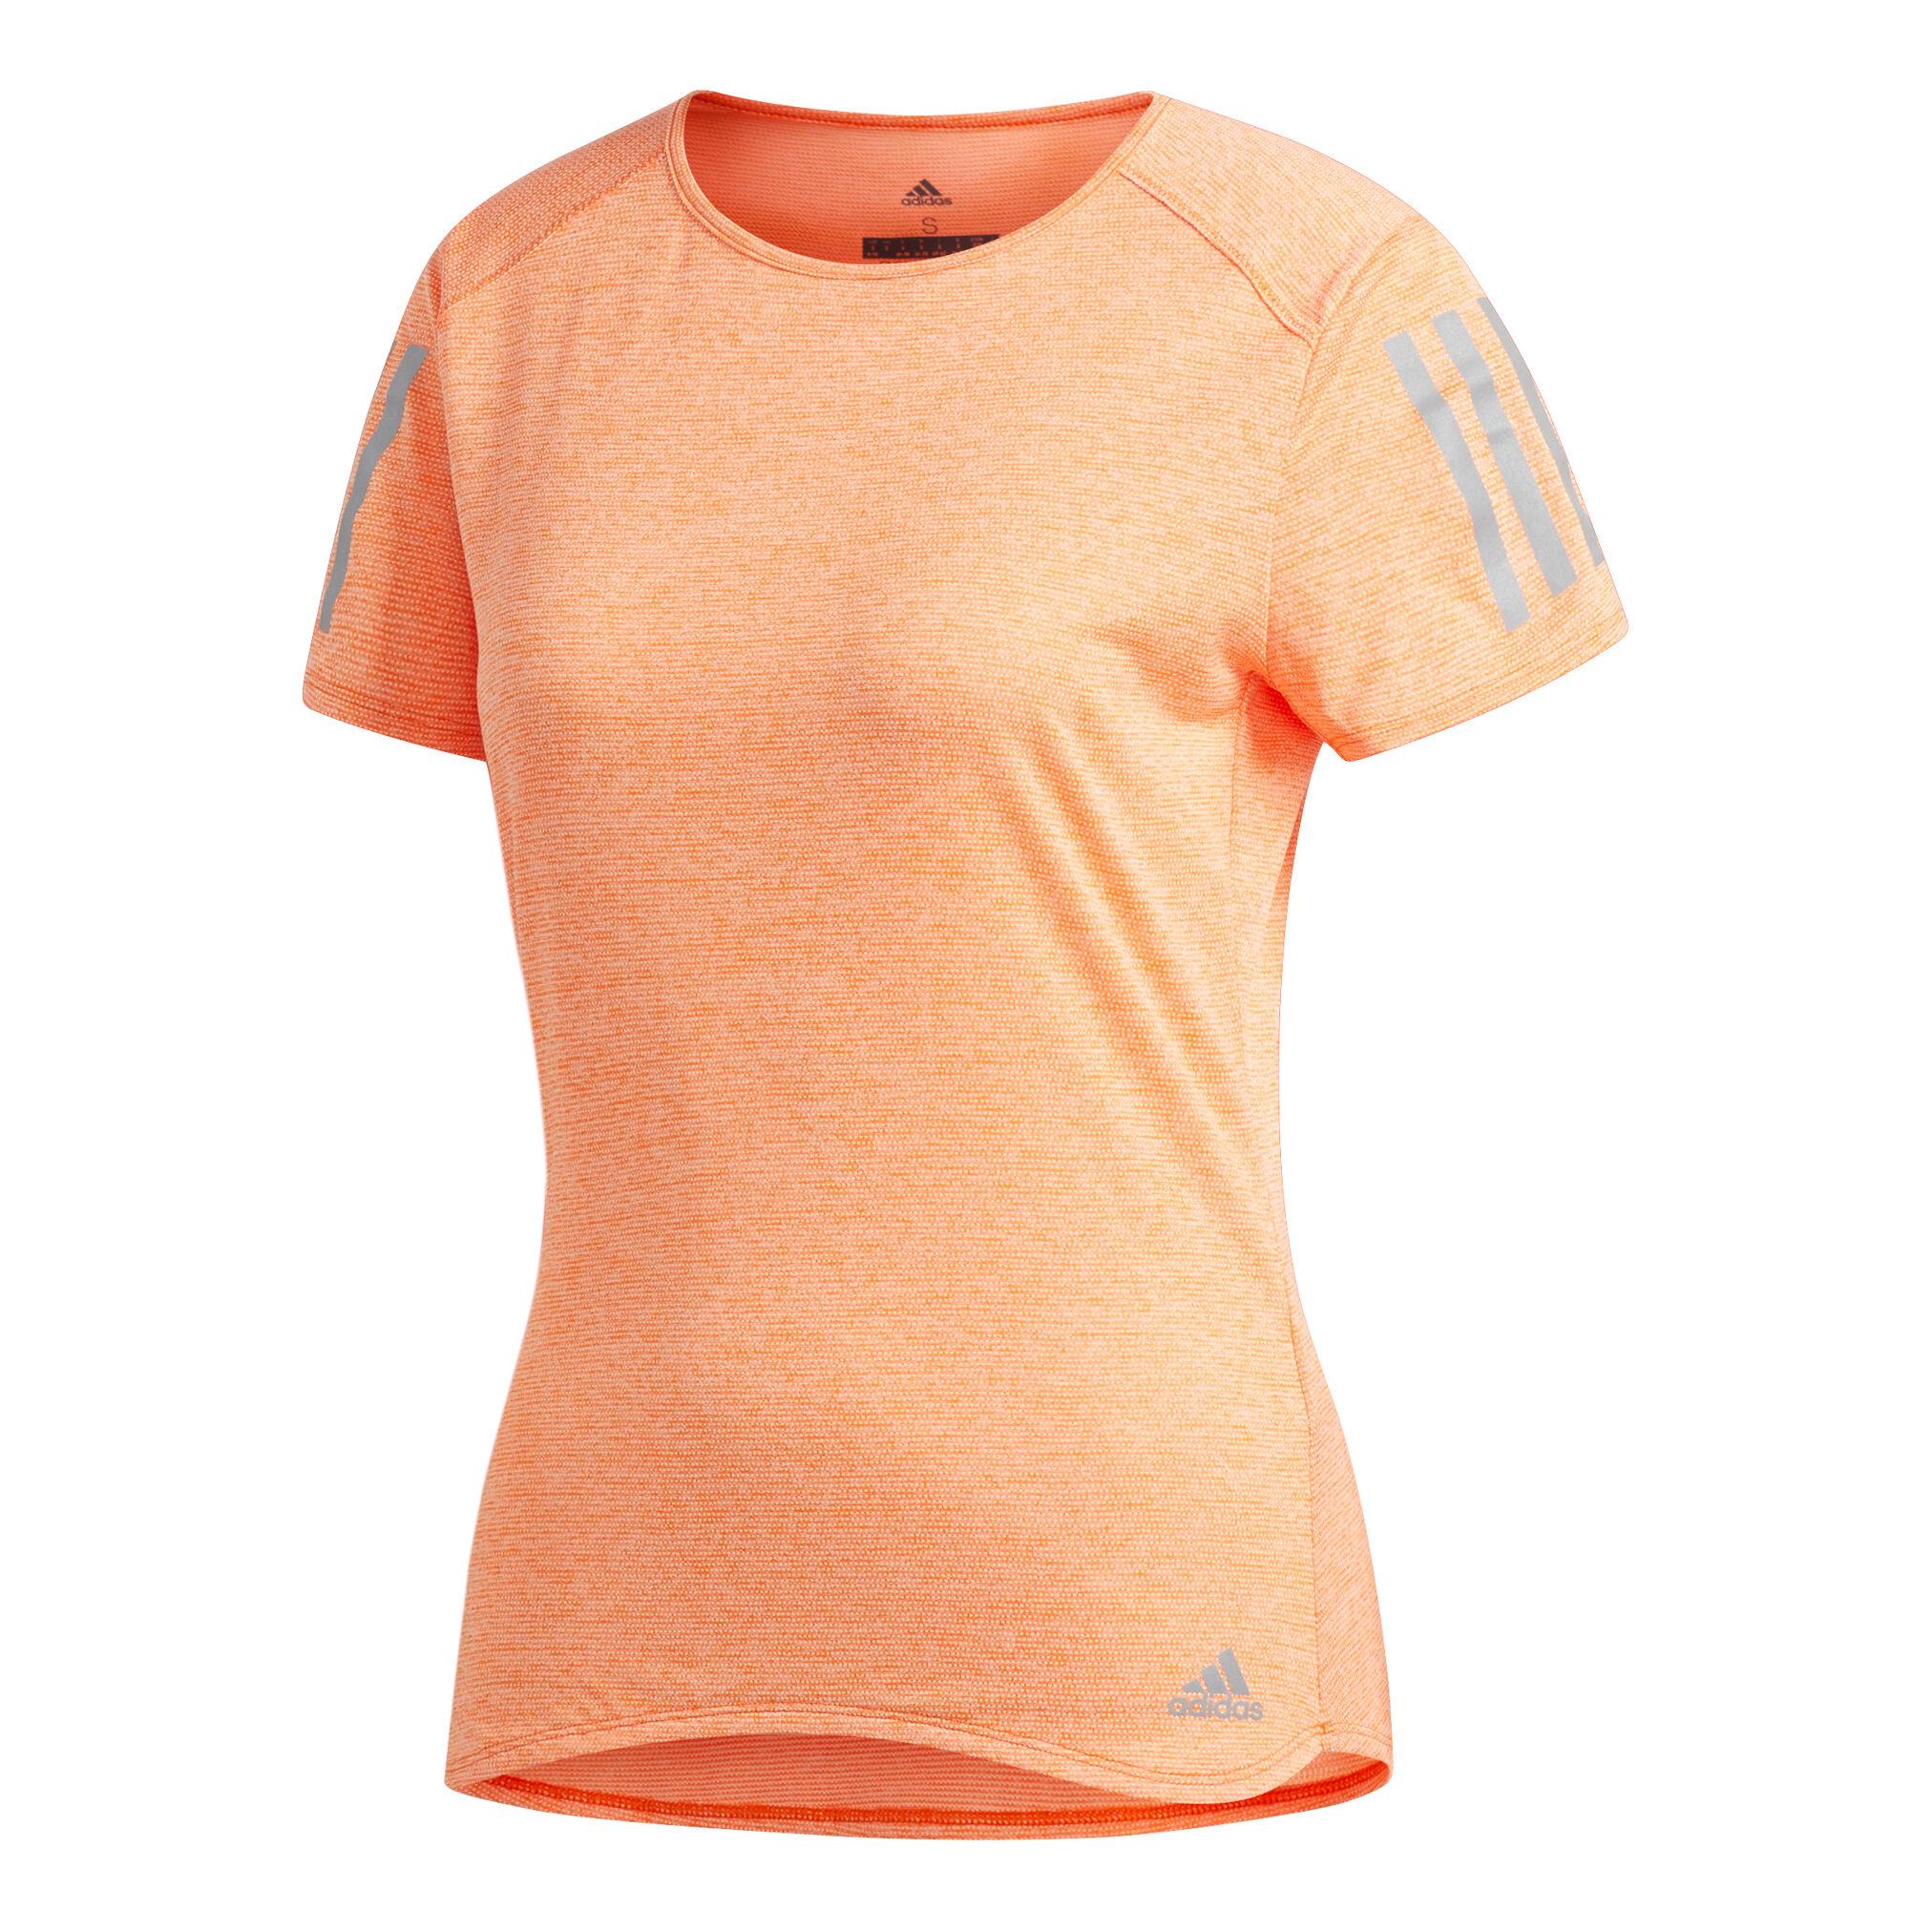 adidas response t-shirt xl damen